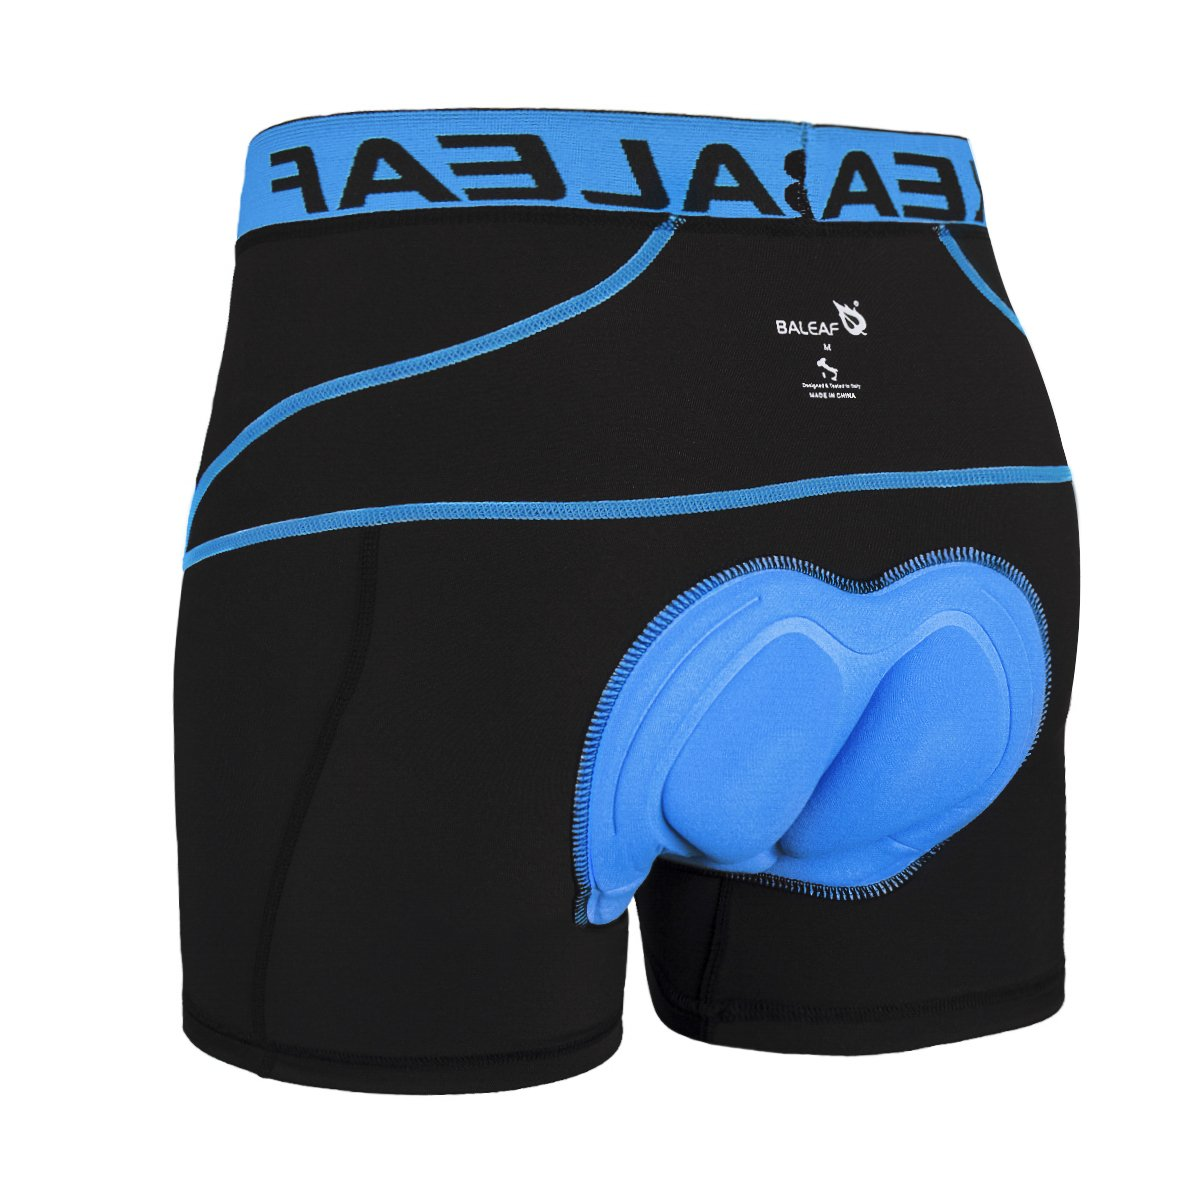 Mens 3D Padded Radhose Cyclist Pants Bike Short Pants Underwear Shorts